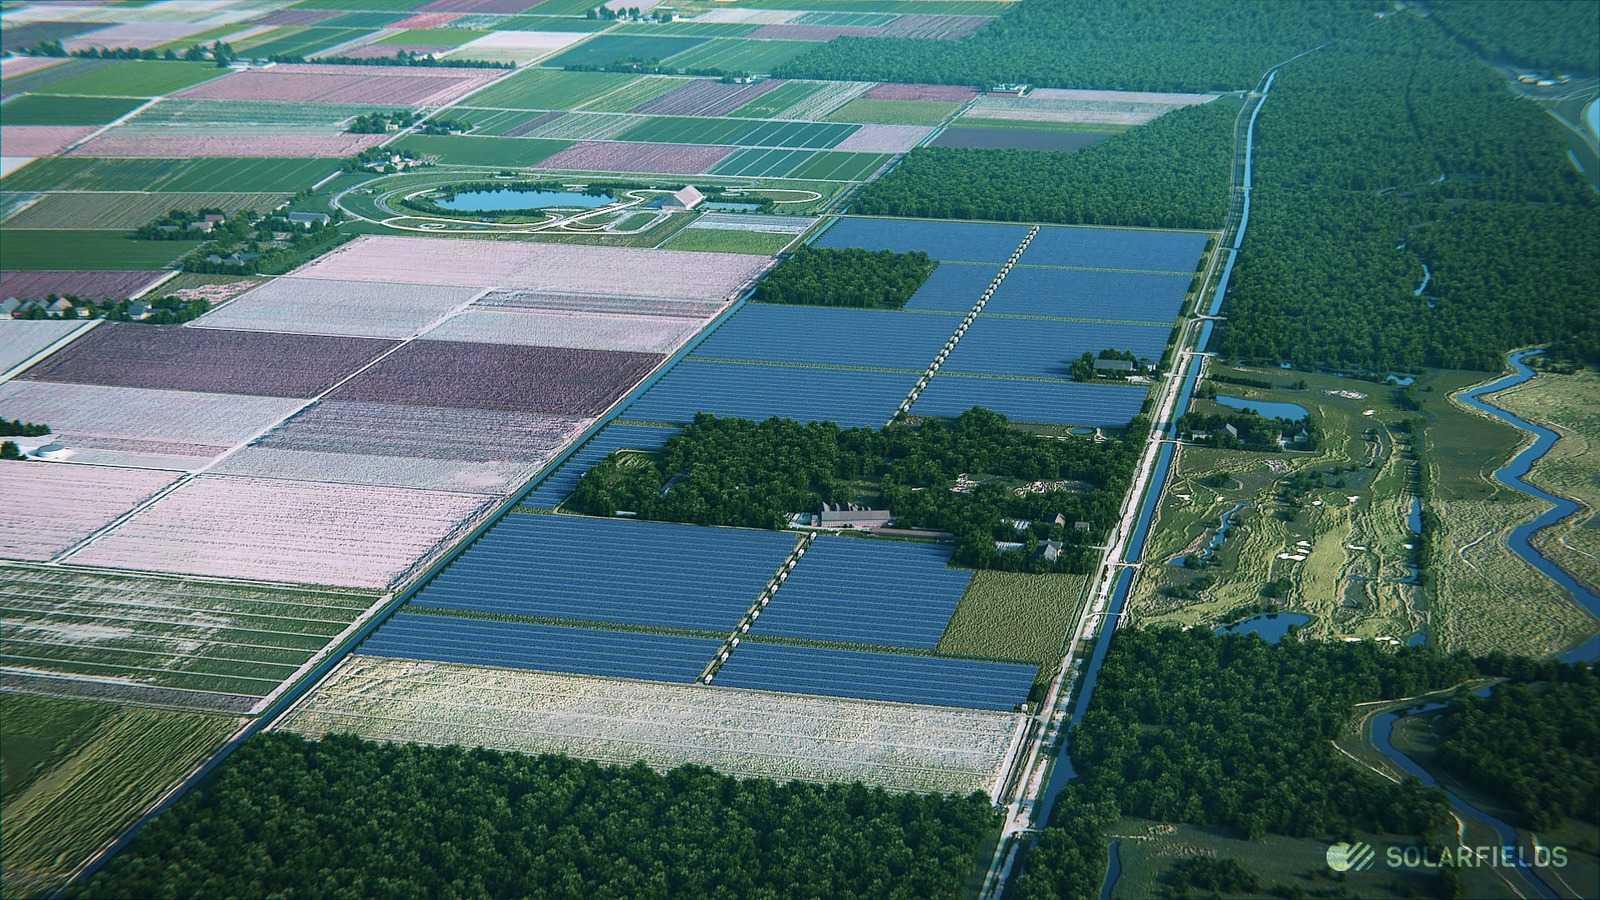 Проект солнечного парка Dorhout Mees – Biddinghuizen. Фото: Solarfields.